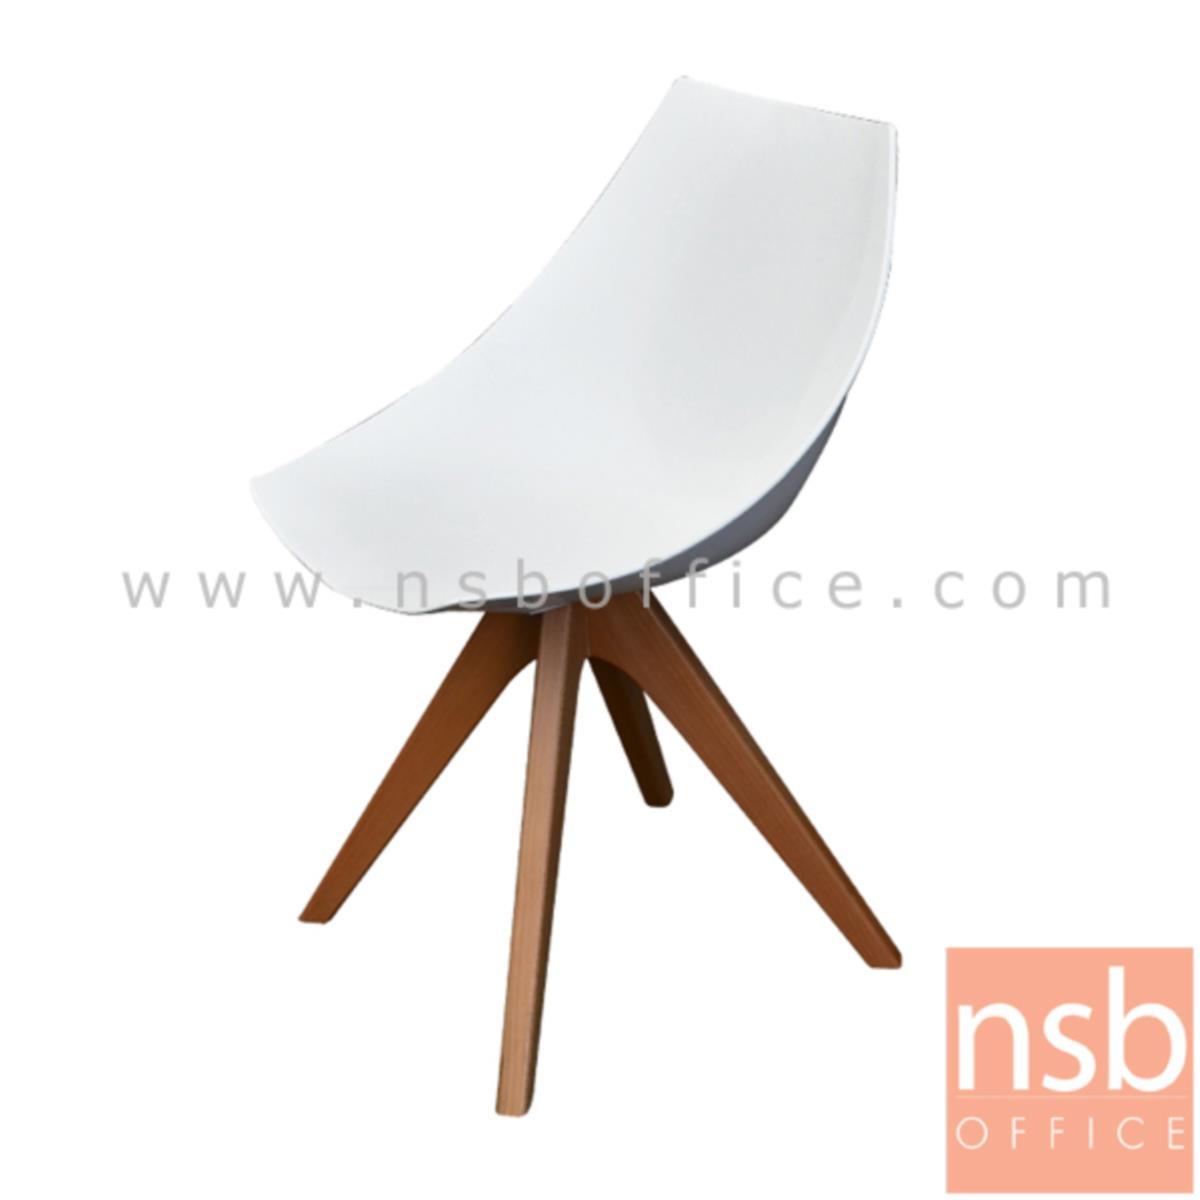 B29A163:เก้าอี้โมเดิร์นโพลี่ รุ่น PN92167 ขนาด 50W cm. โครงขาไม้